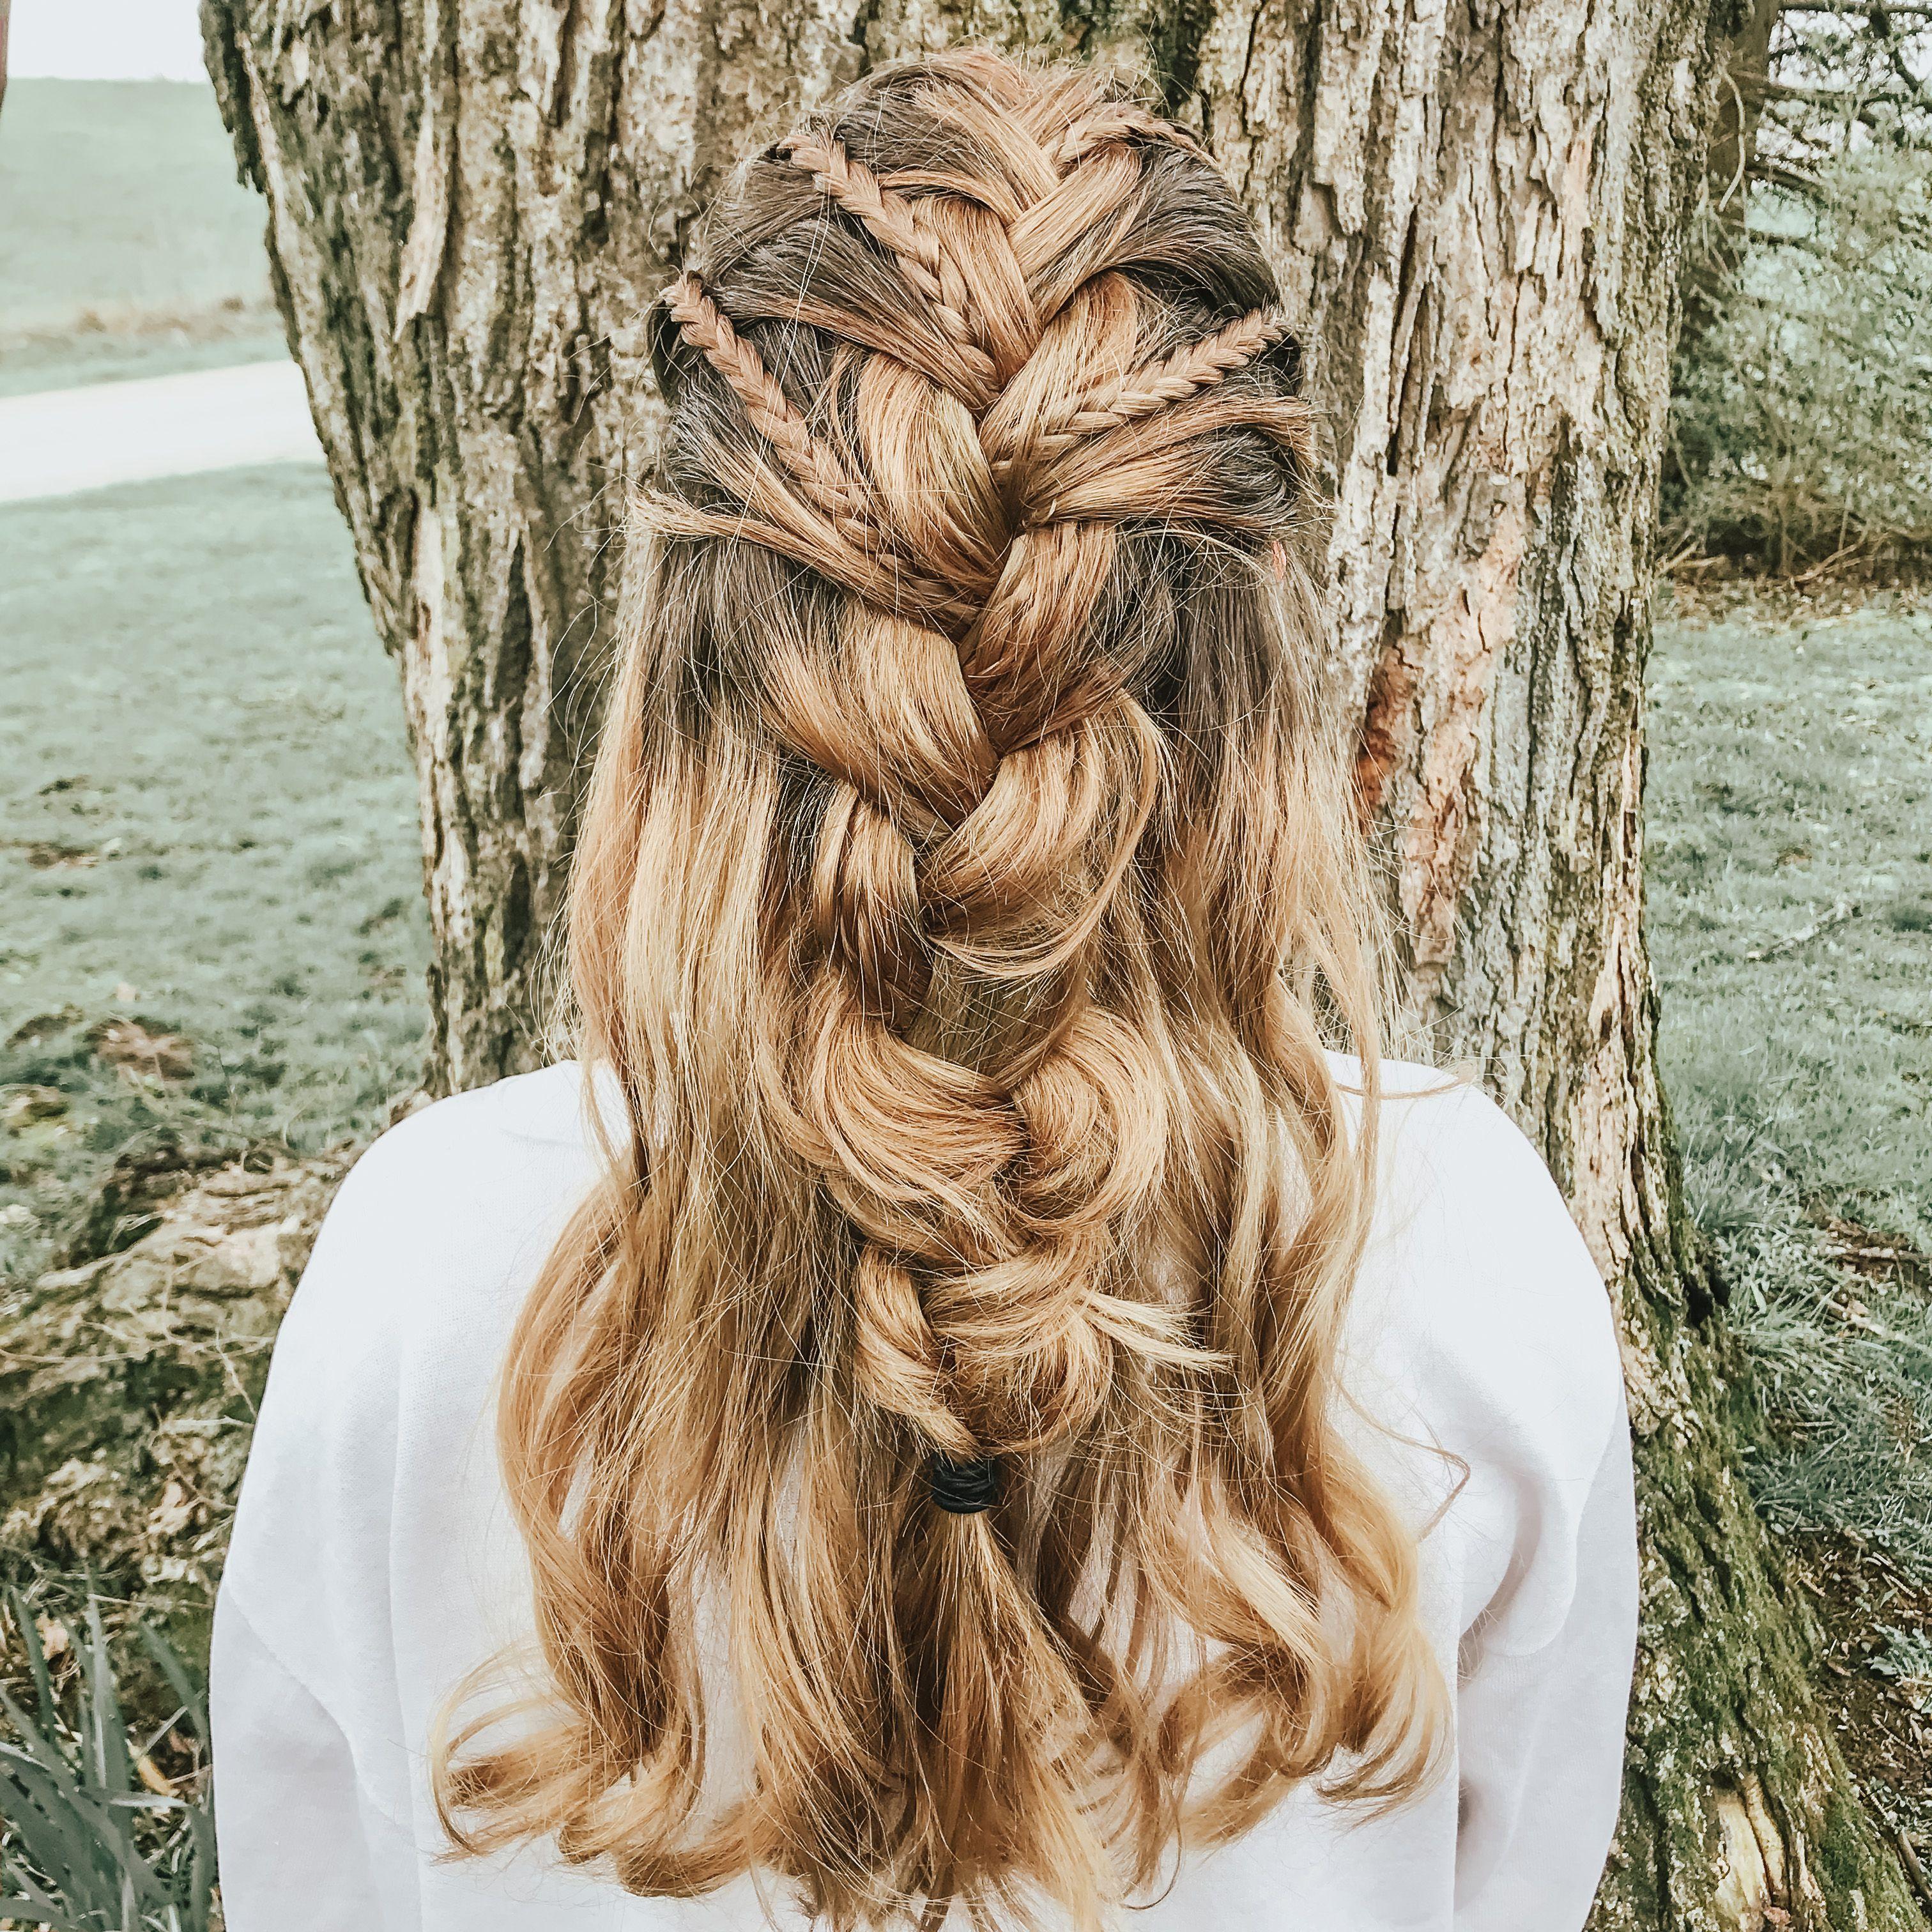 Braided Hairstyle Braided Hairstyles Half Up Hair Hair Styles